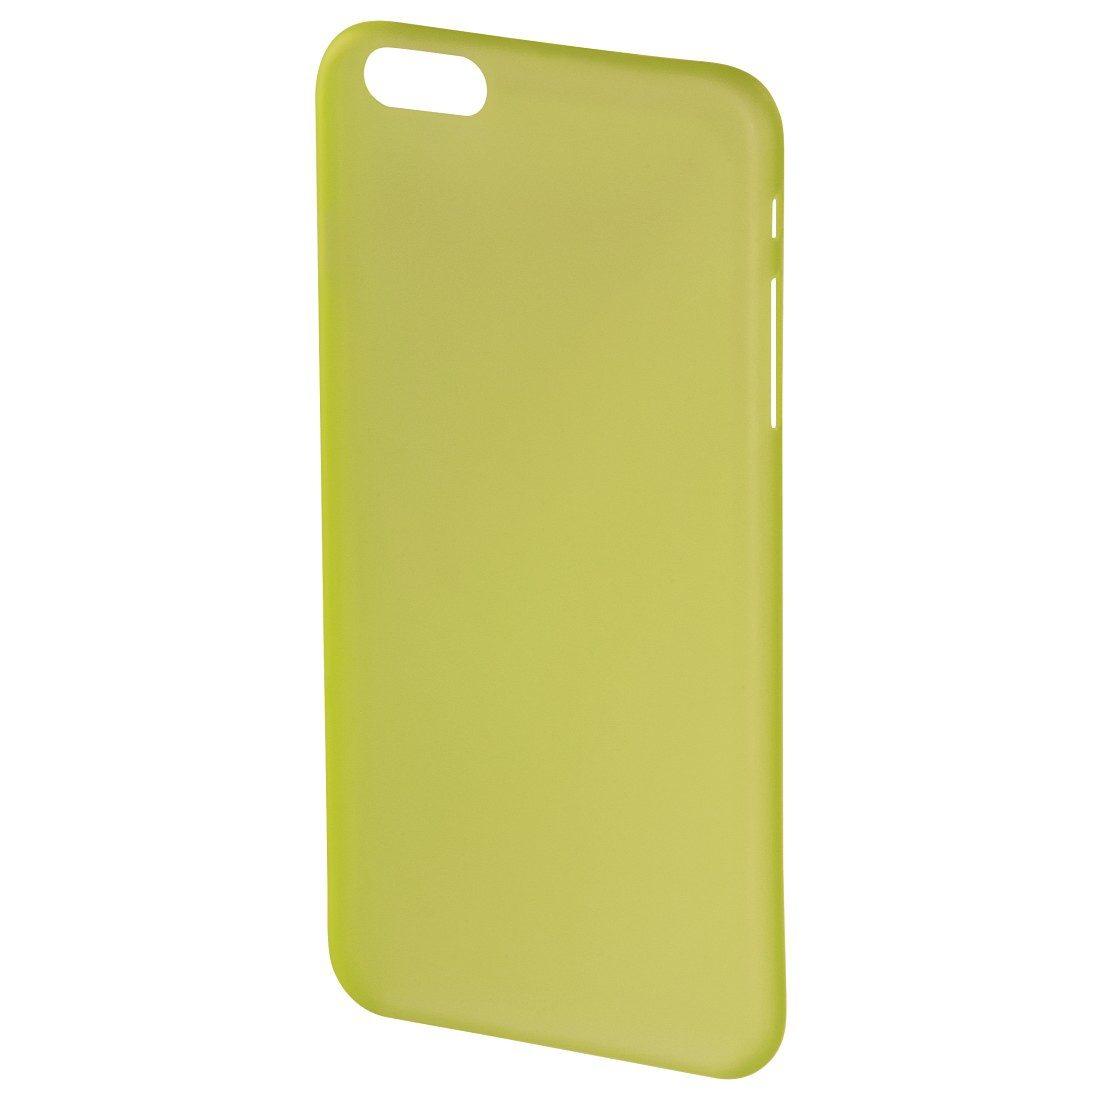 Hama Cover Ultra Slim für Apple iPhone 6/6s, Gelb